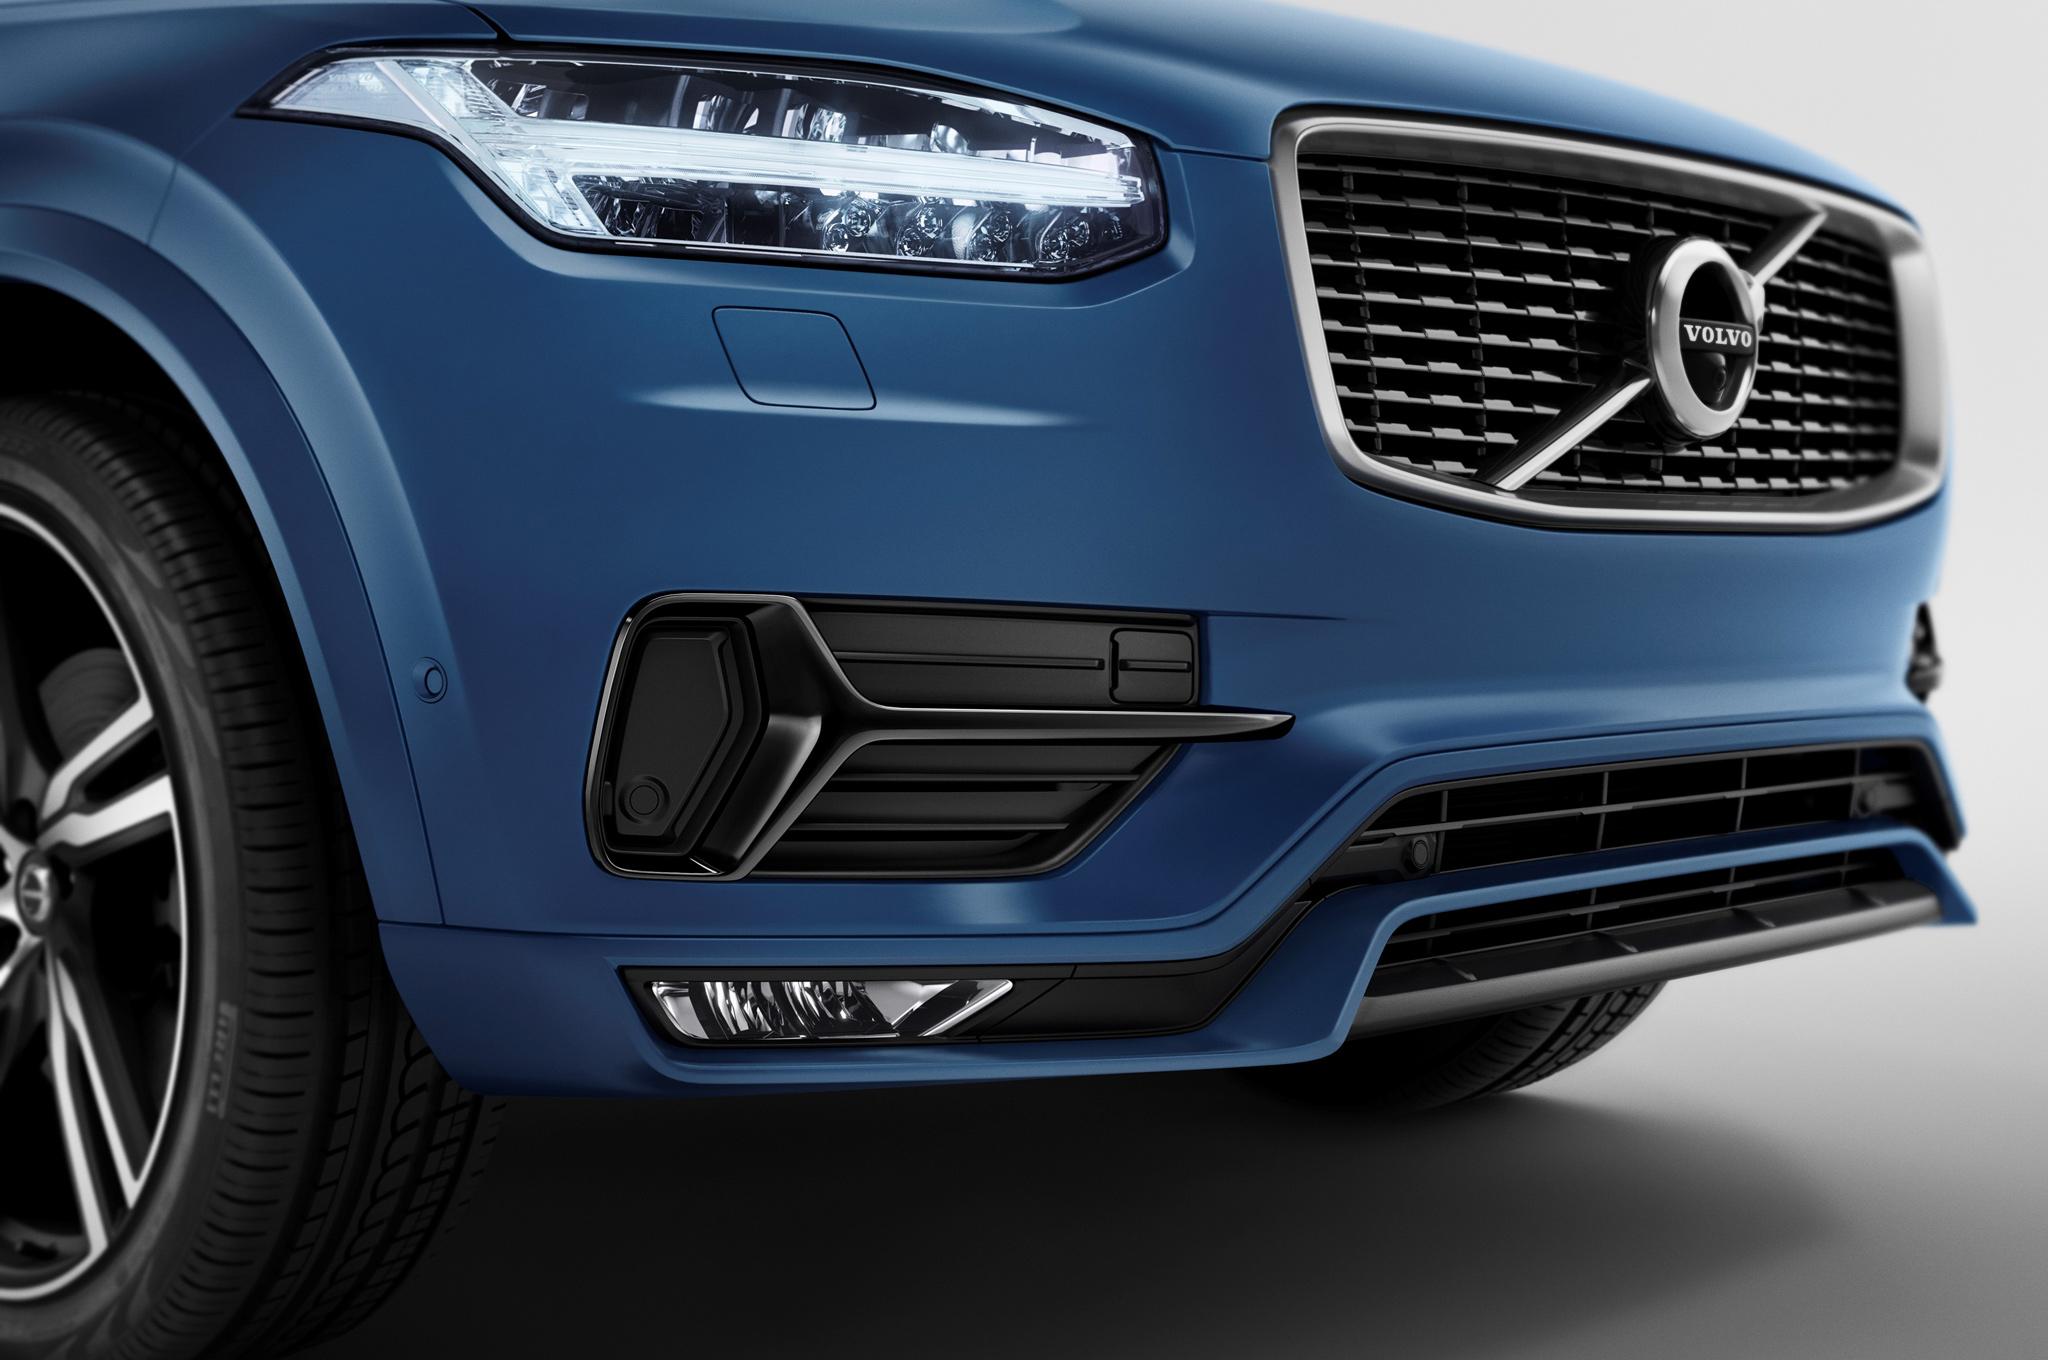 2016 Volvo Xc90 R-Design Front Bumper and Headlamp